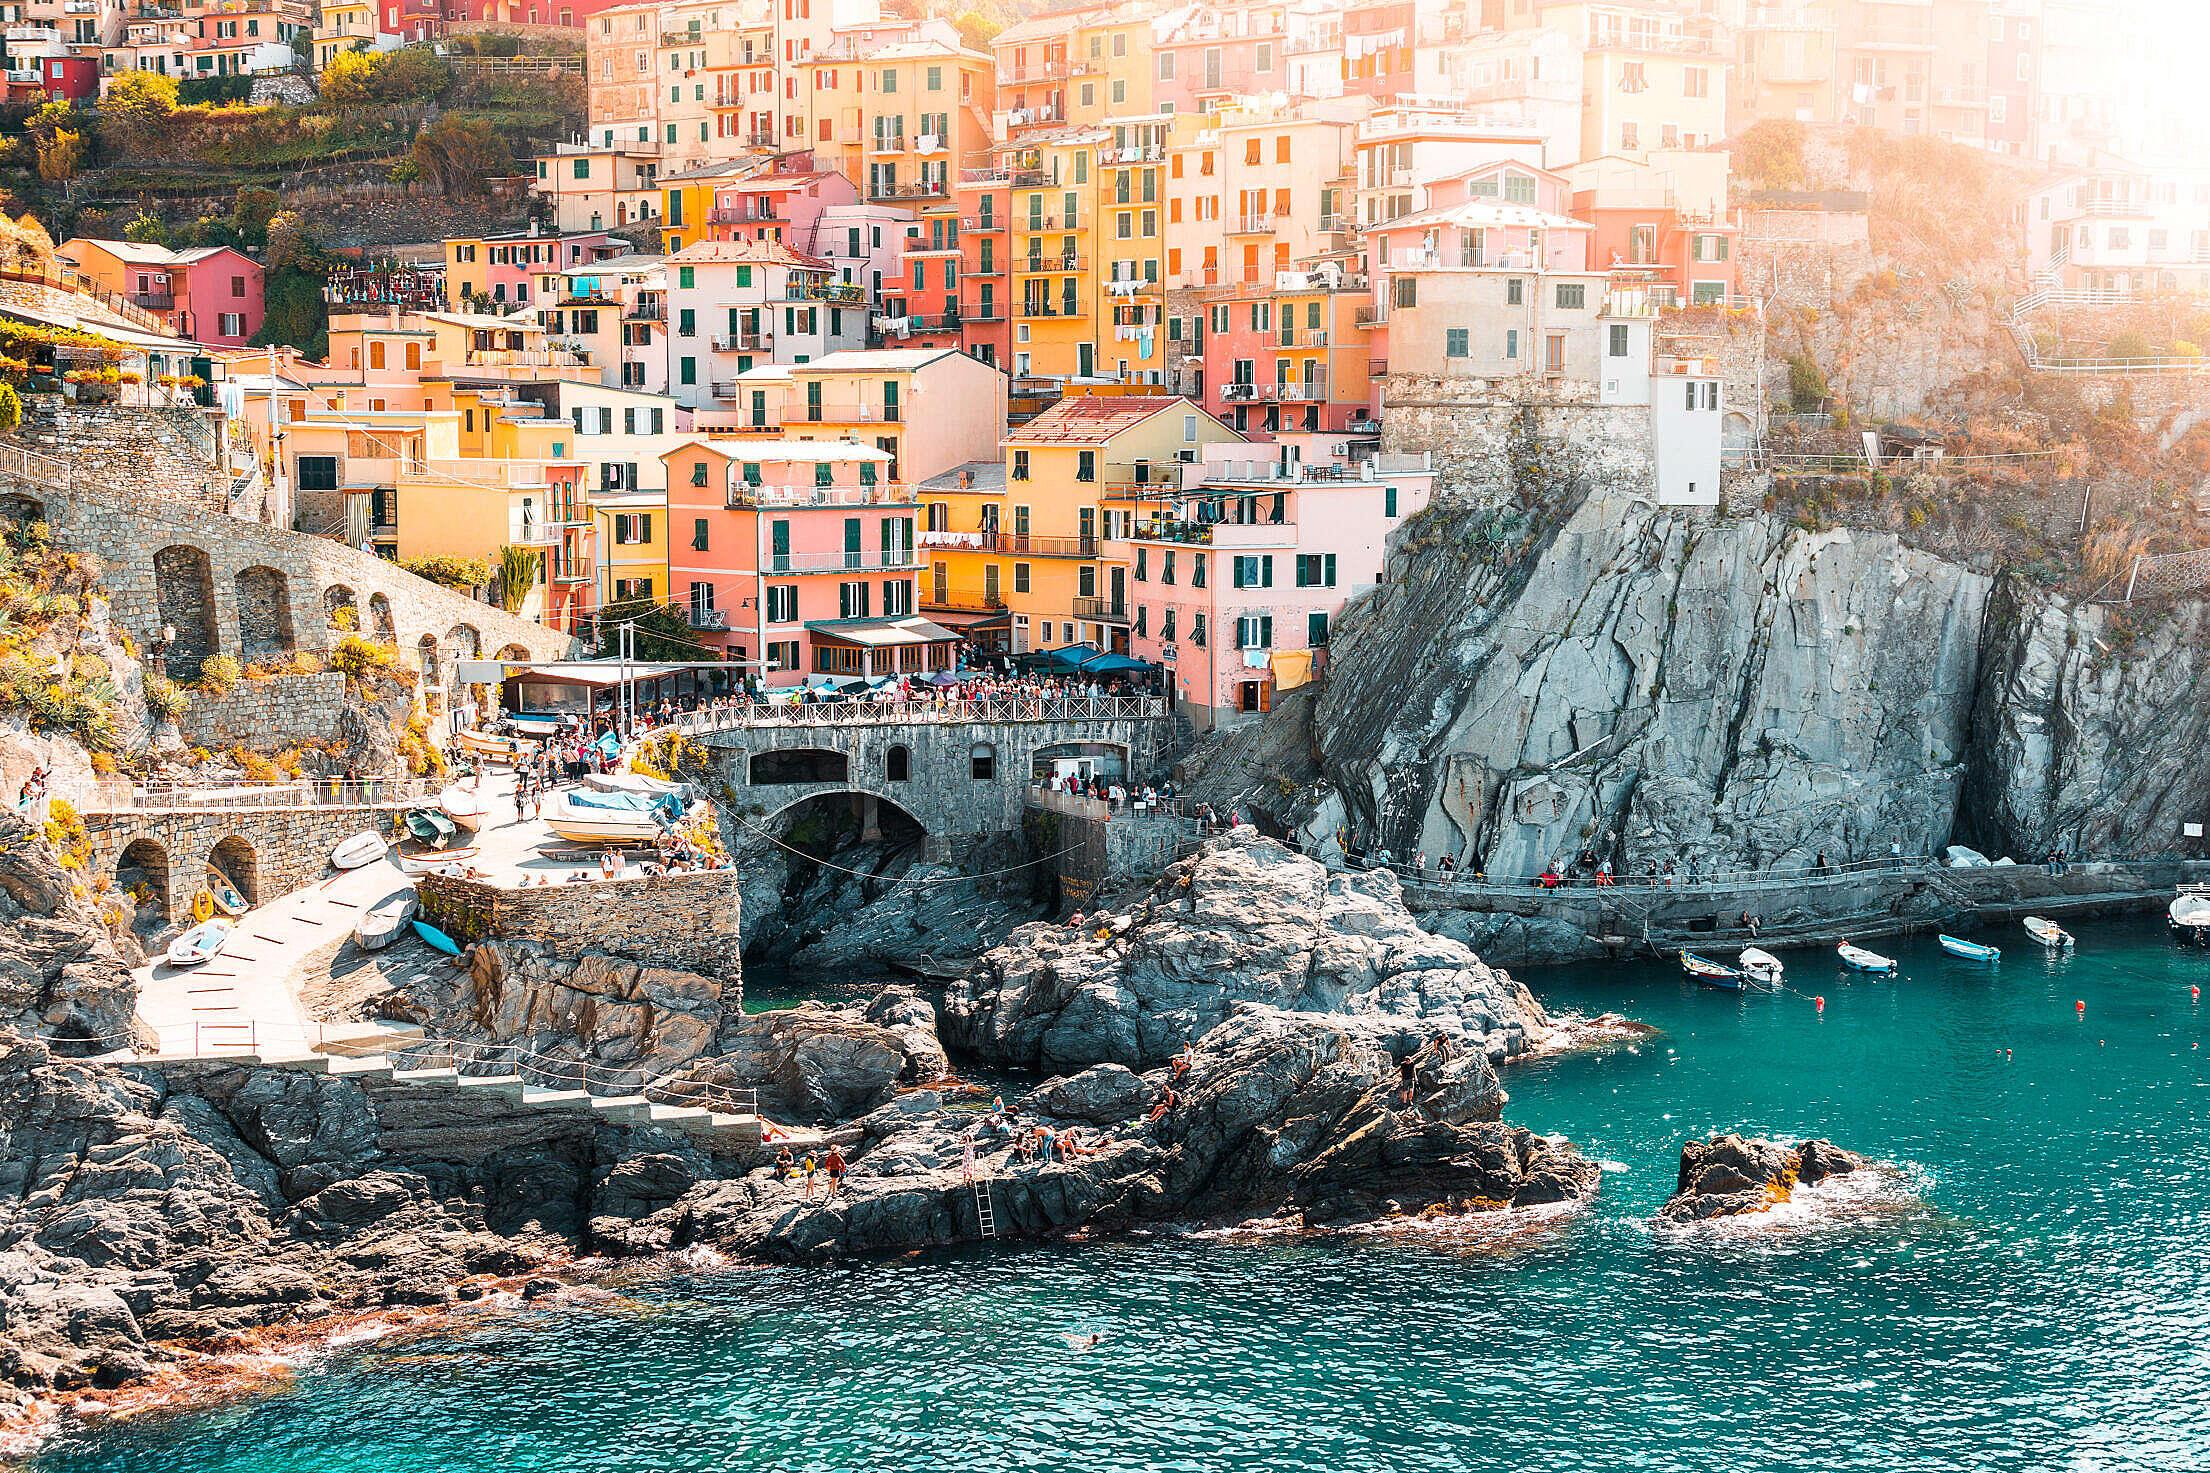 Manarola Town in Cinque Terre, Italy Free Stock Photo